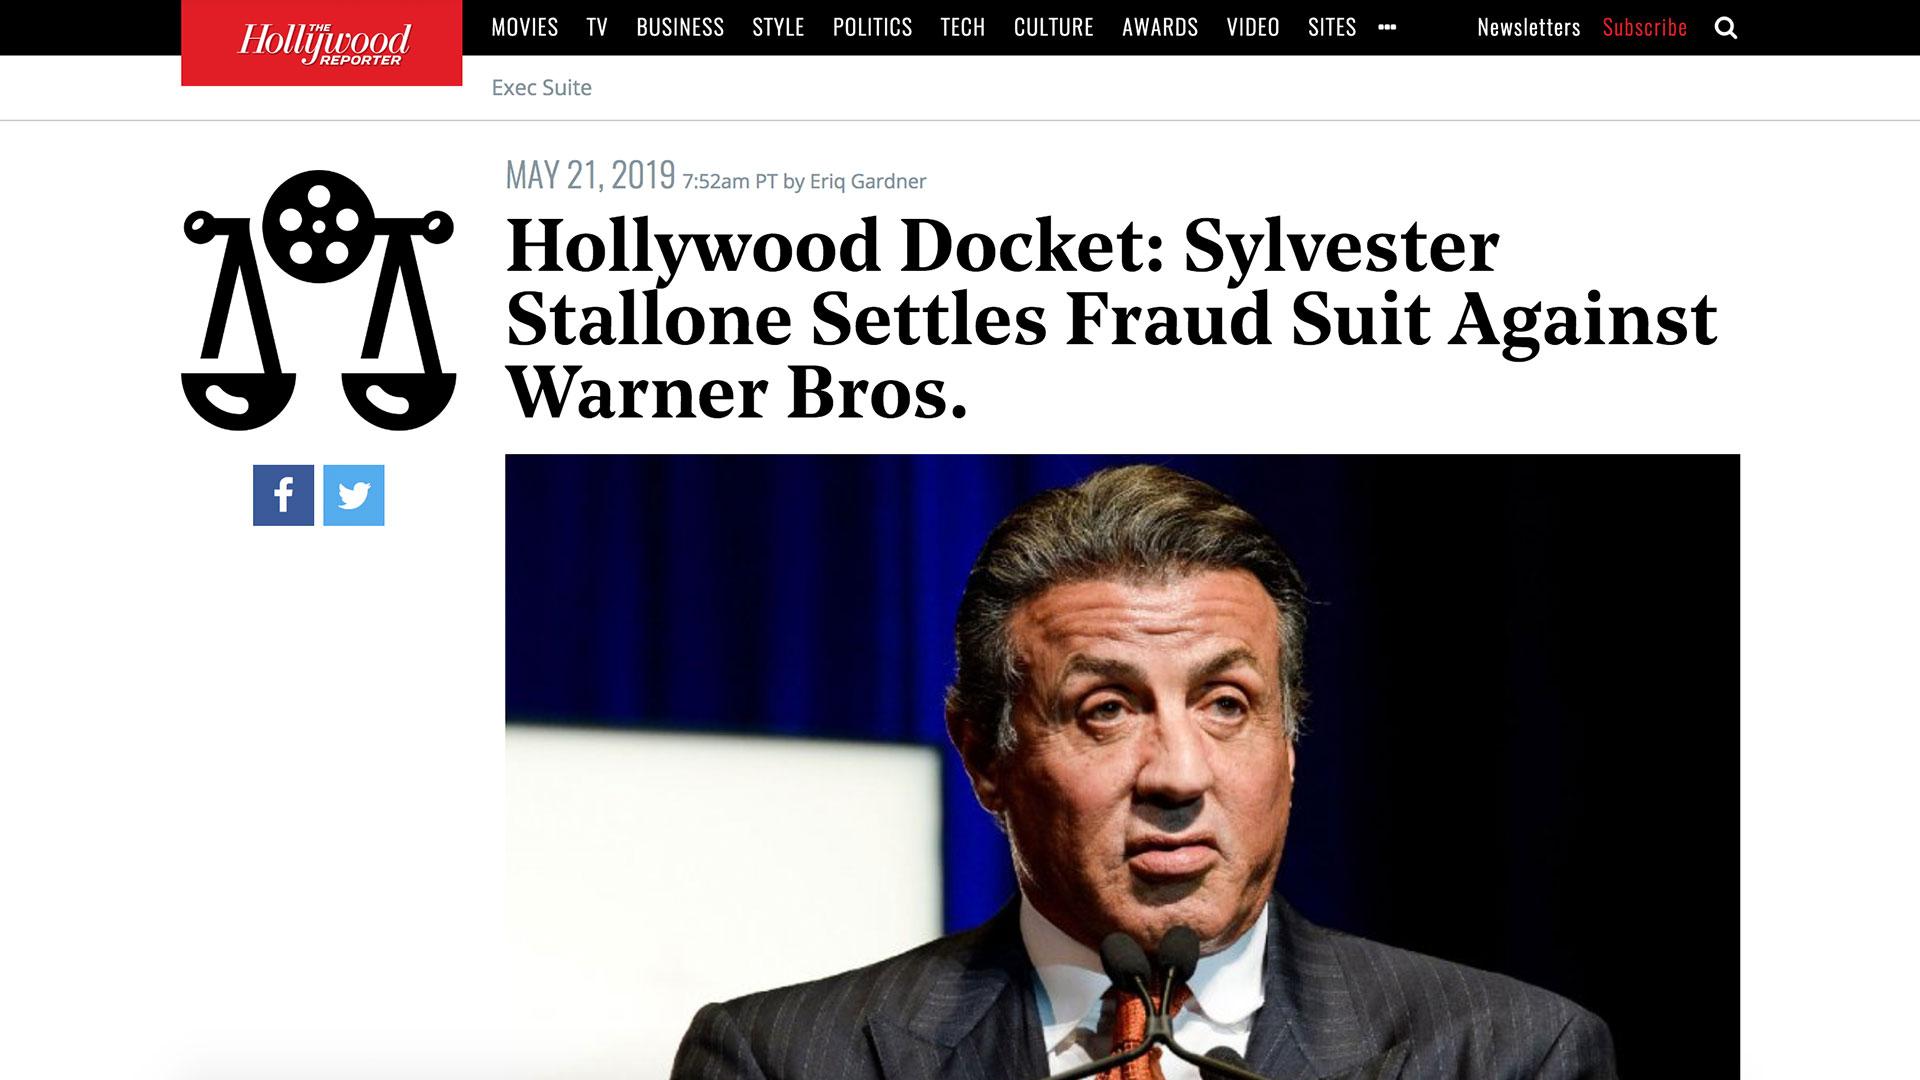 Fairness Rocks News Hollywood Docket: Sylvester Stallone Settles Fraud Suit Against Warner Bros.